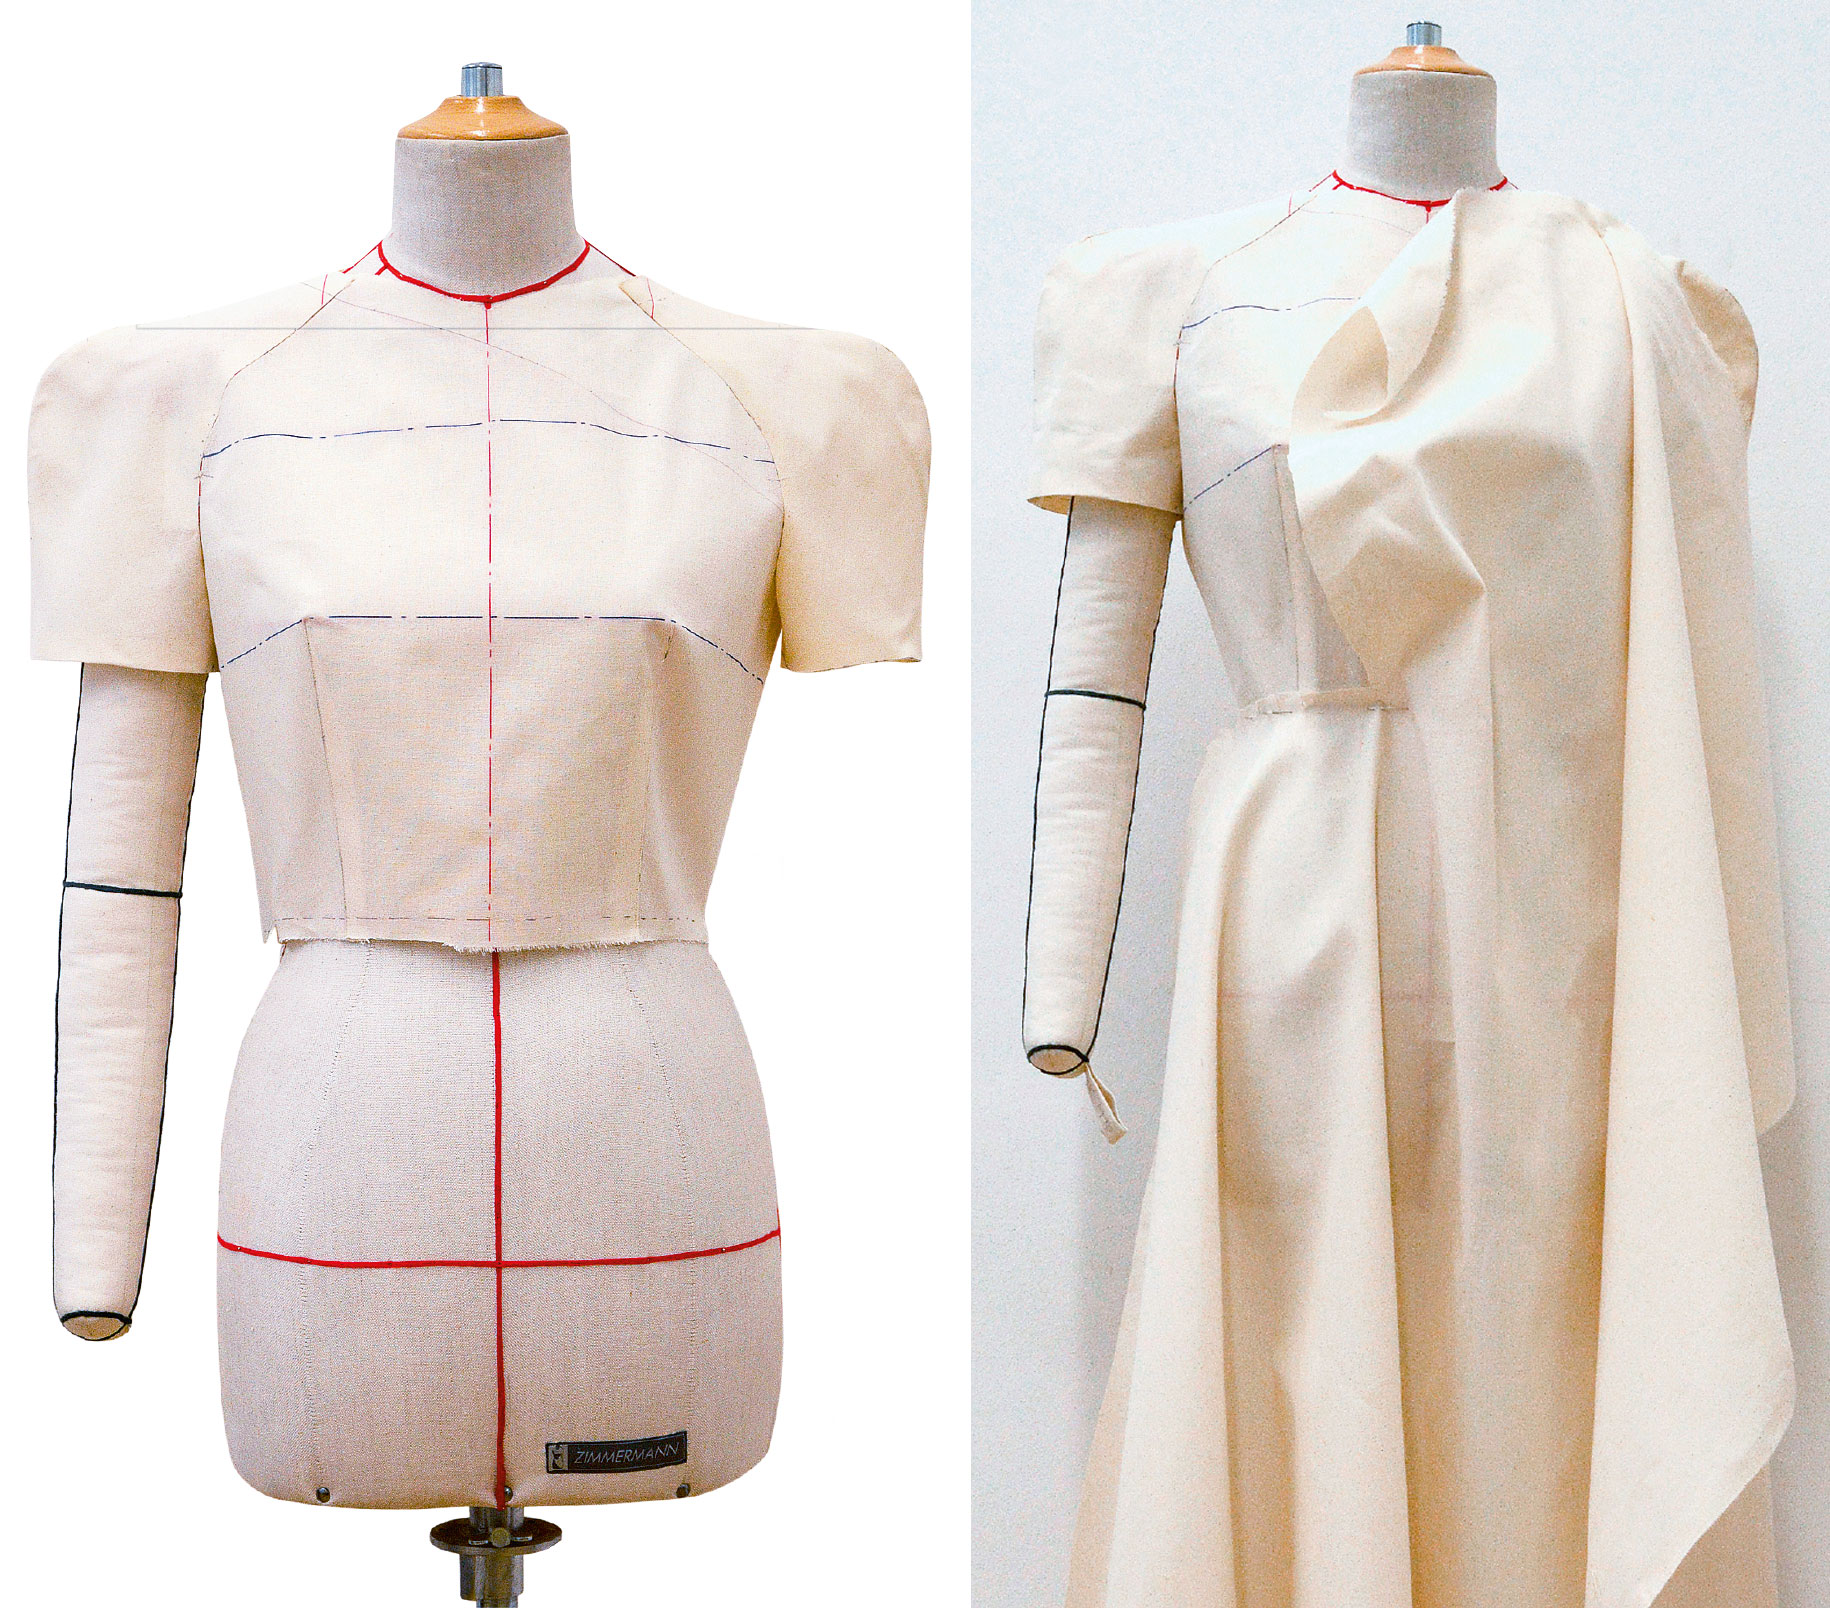 Kleid Drapage Tutorial Step 31-32